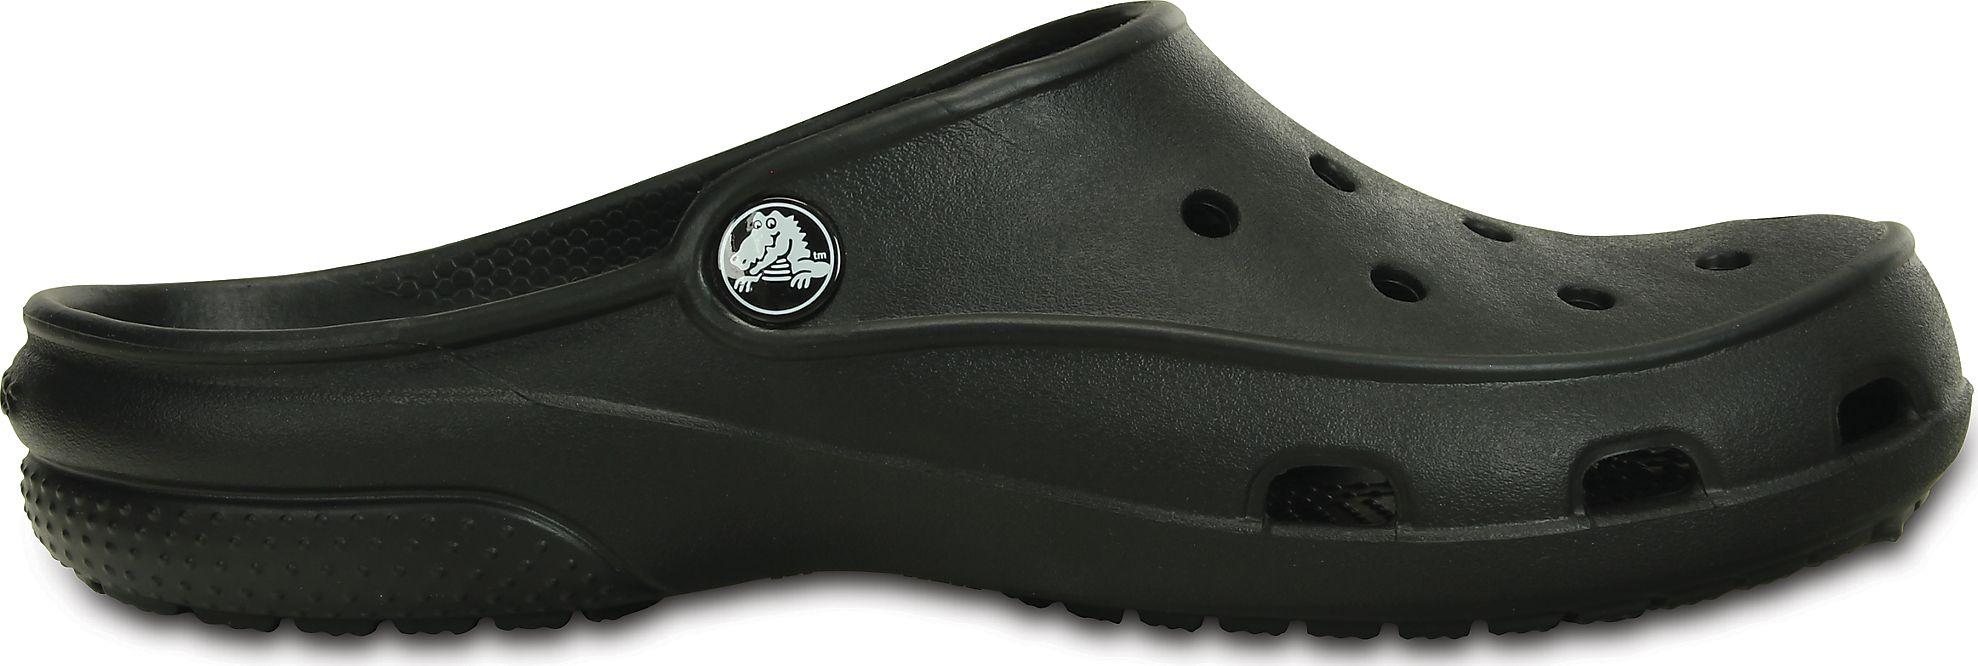 Crocs™ Women's Crocs Freesail Clog Black 36,5